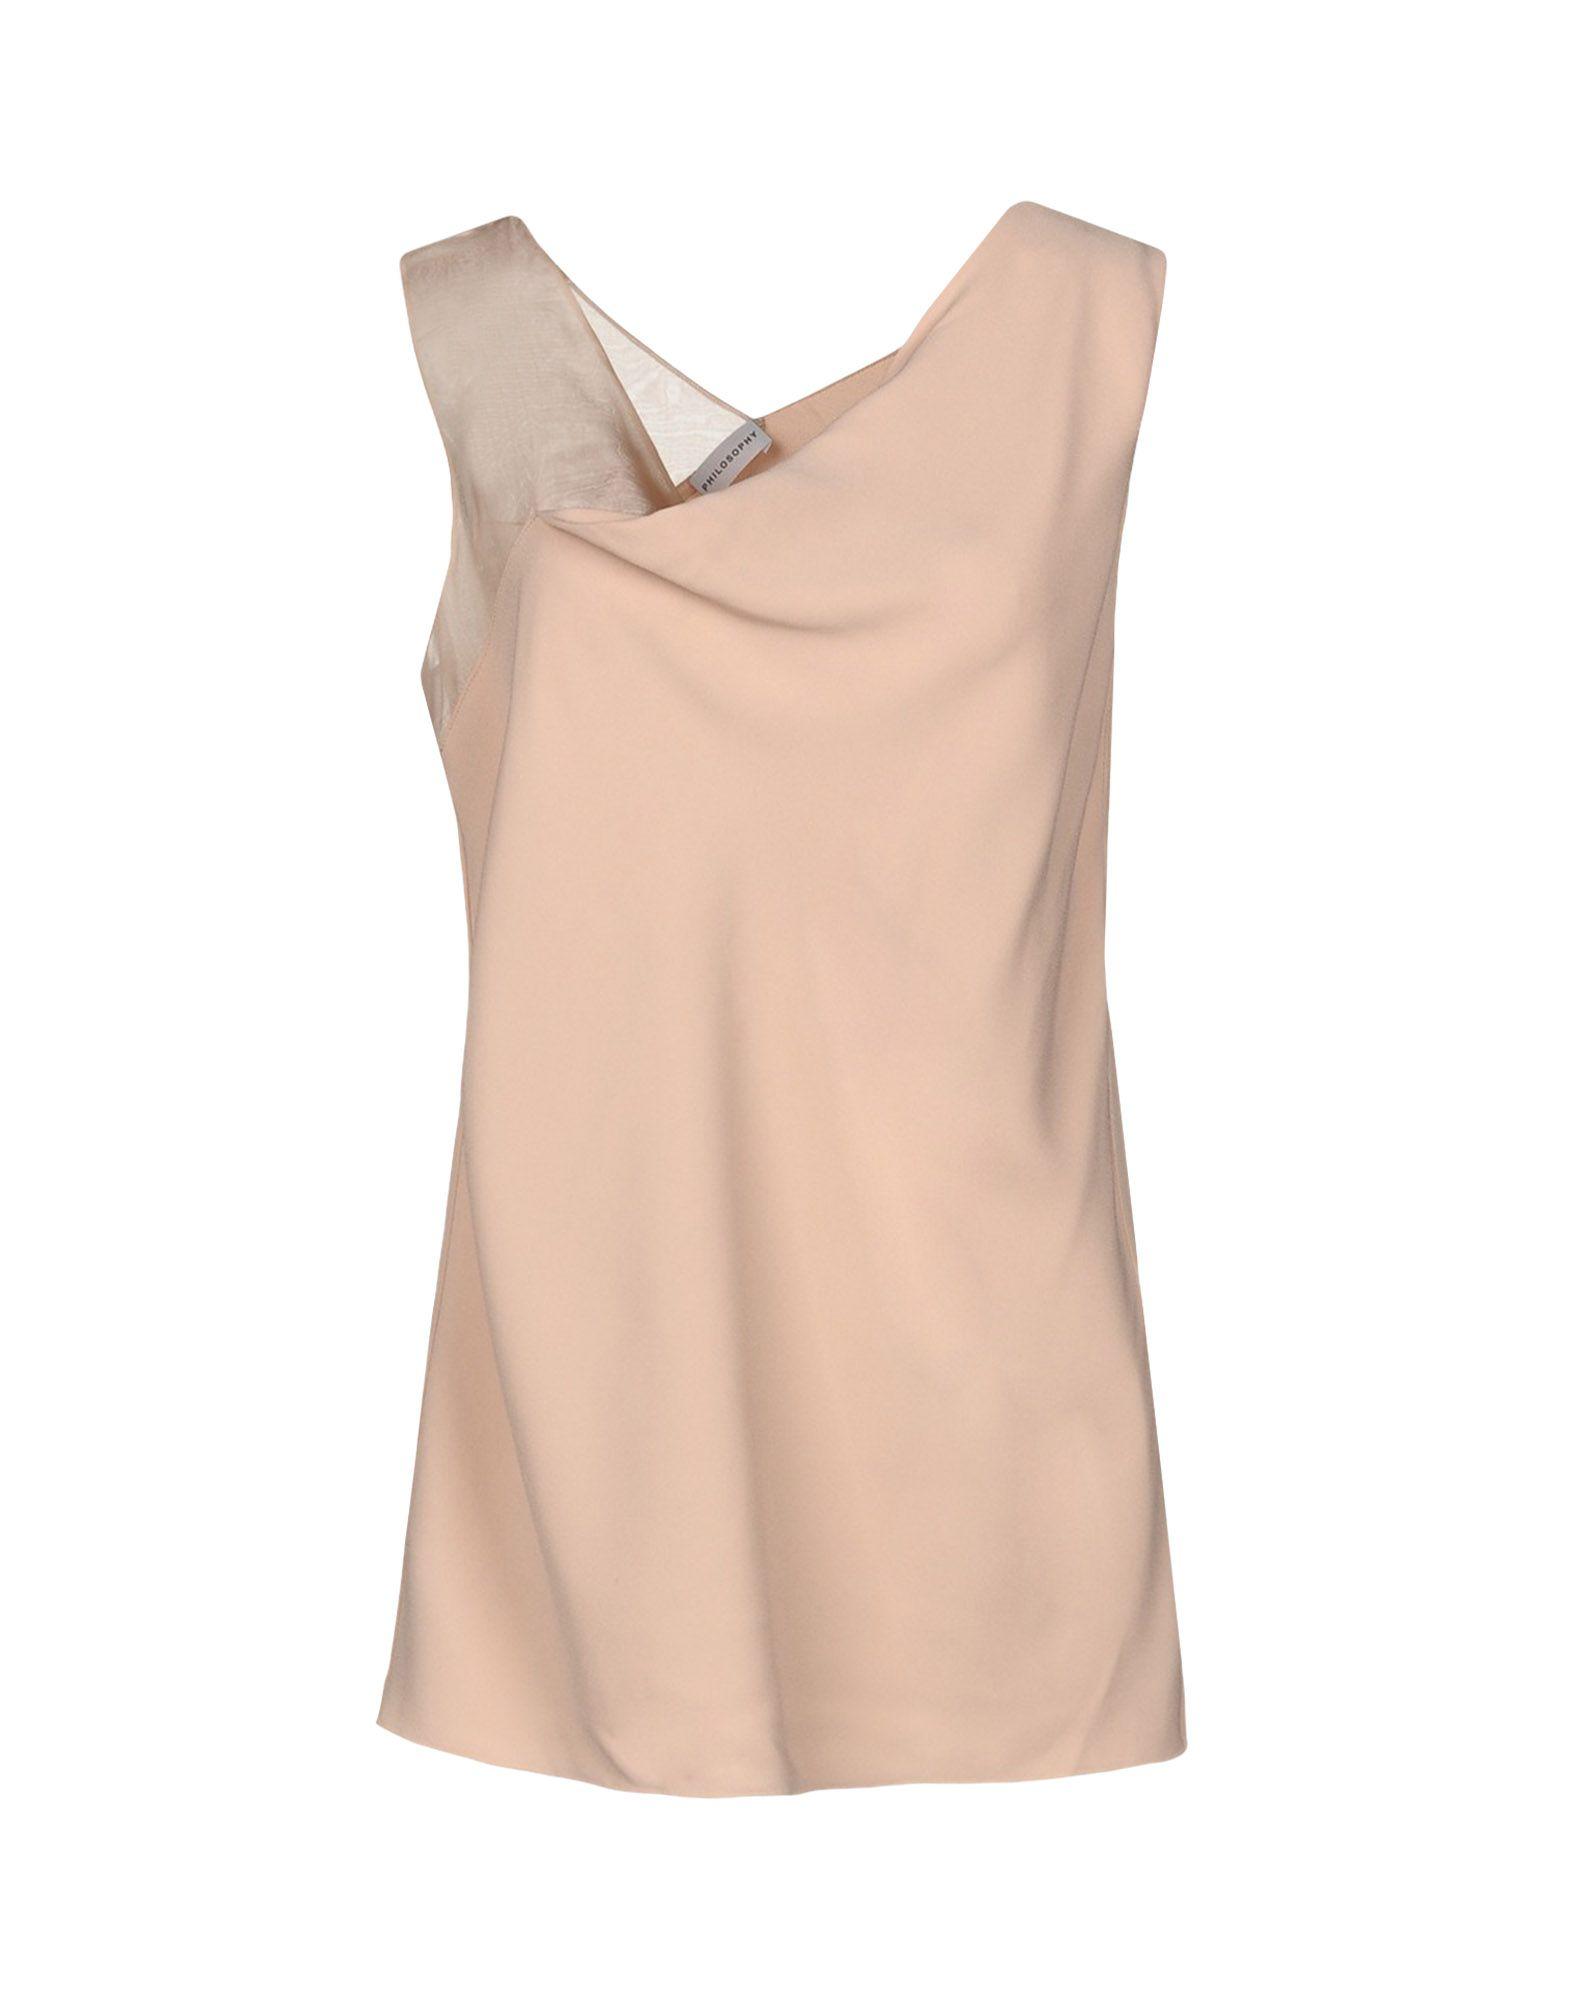 PHILOSOPHY di ALBERTA FERRETTI Топ без рукавов футболка женская nike pro top цвет белый 889540 100 размер s 42 44